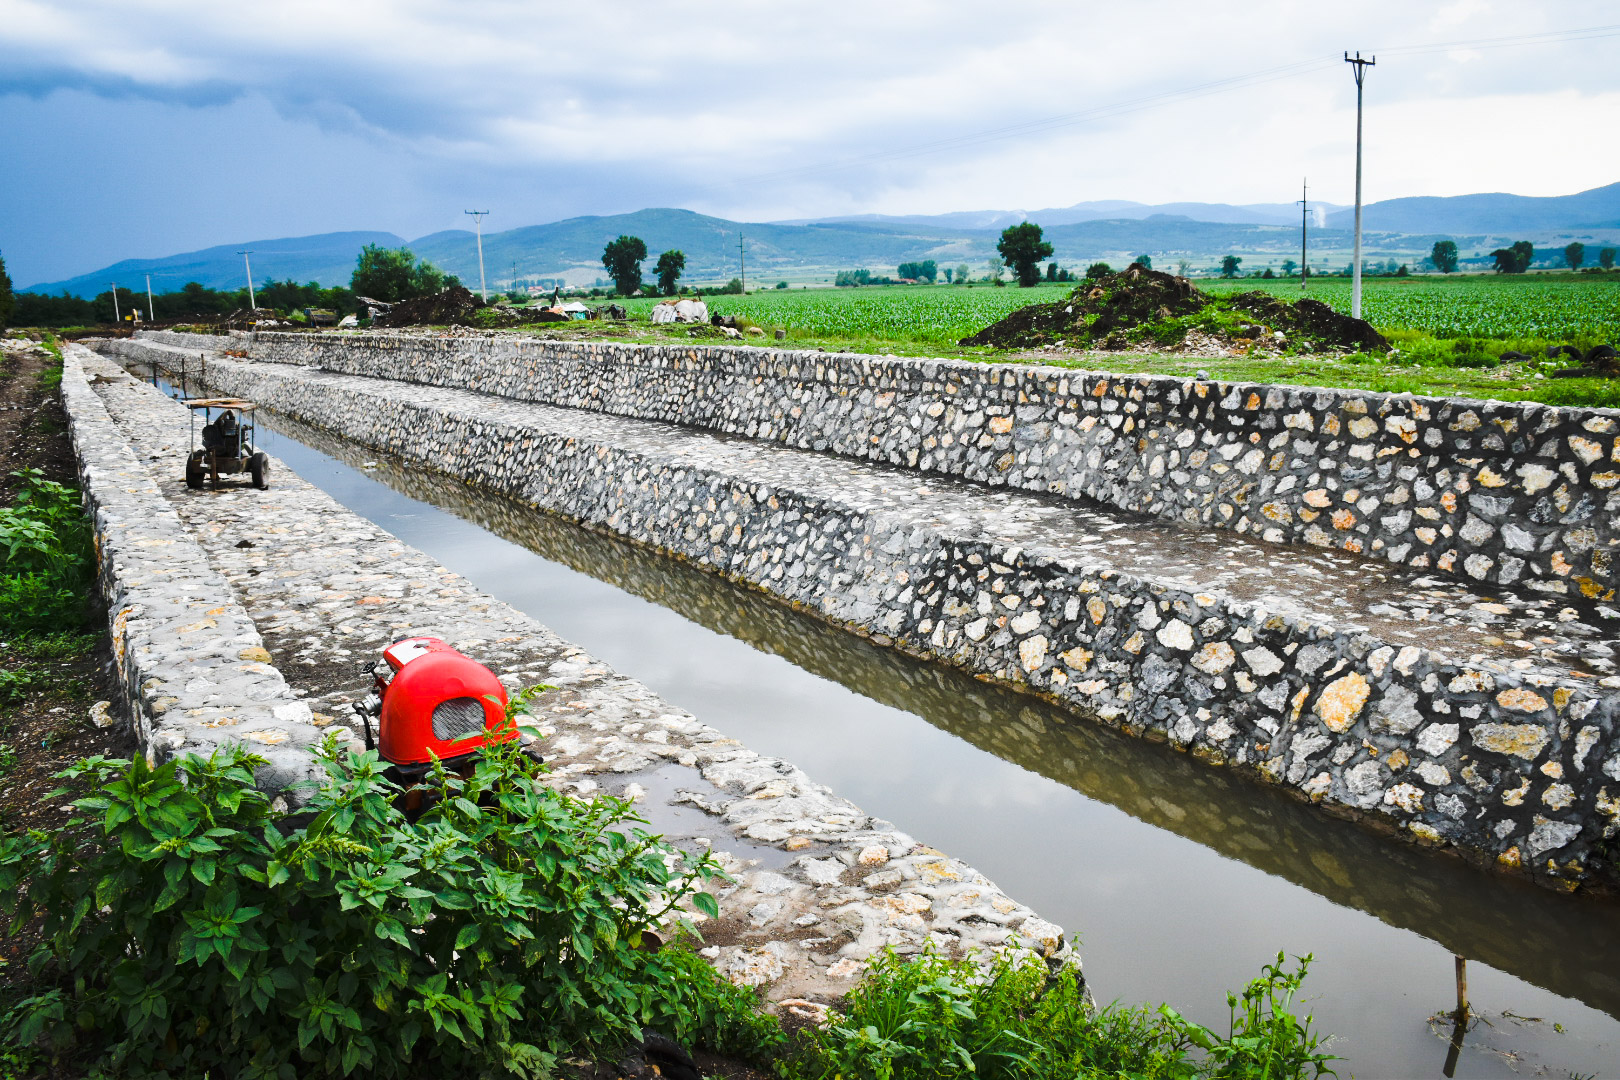 Photo of Grad redovno održava kanale i vodotokove